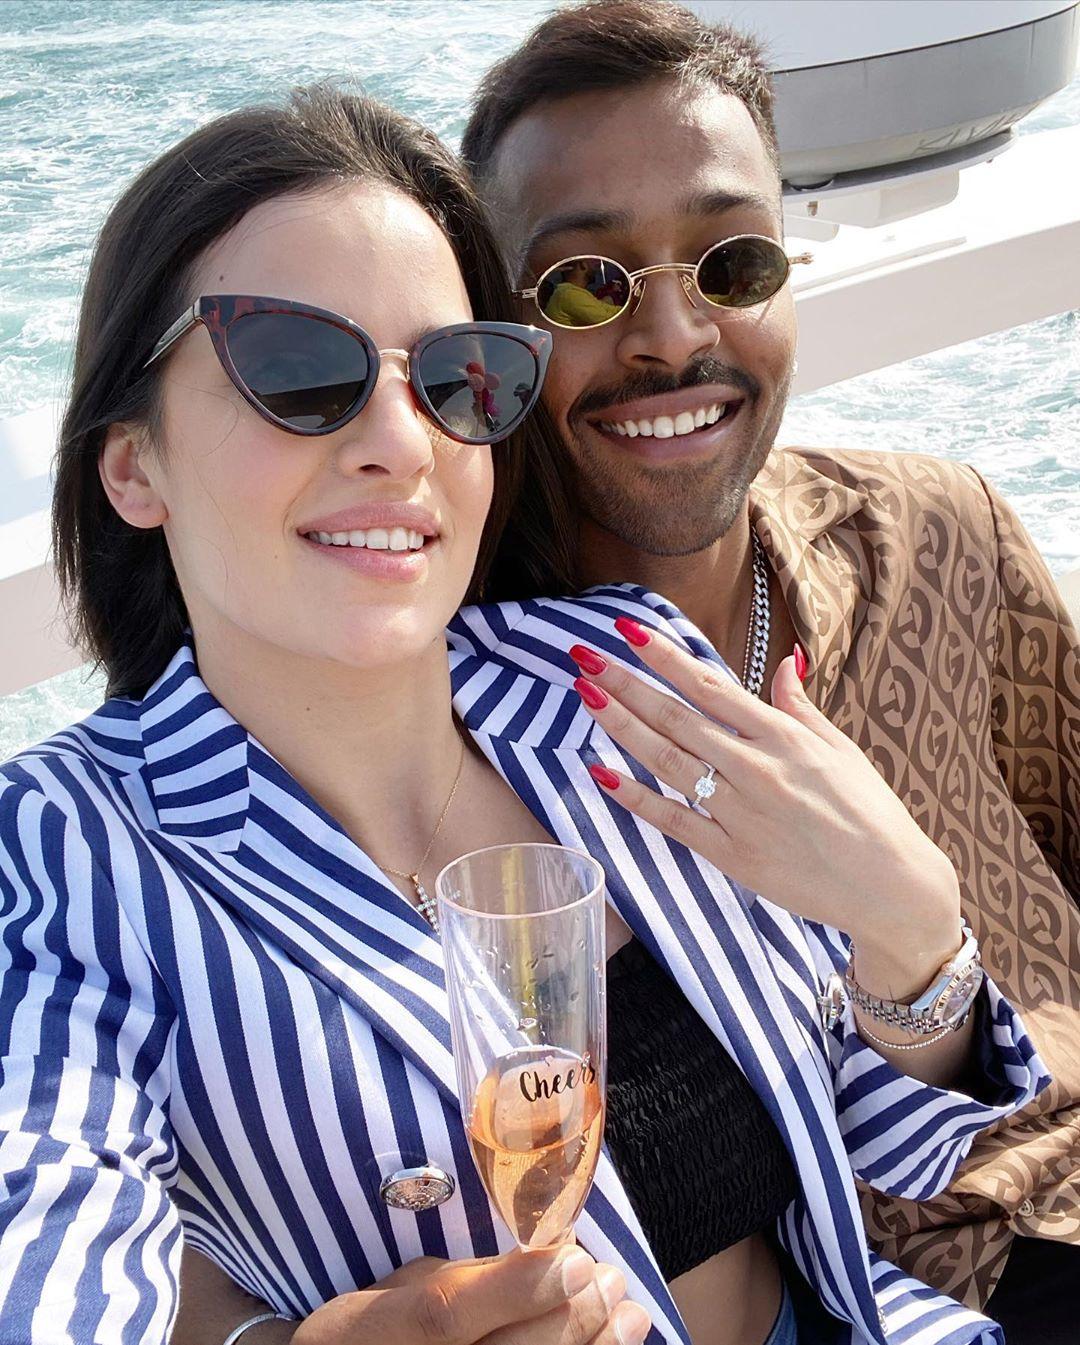 engagement ring, Hardik Pandya's Engagement